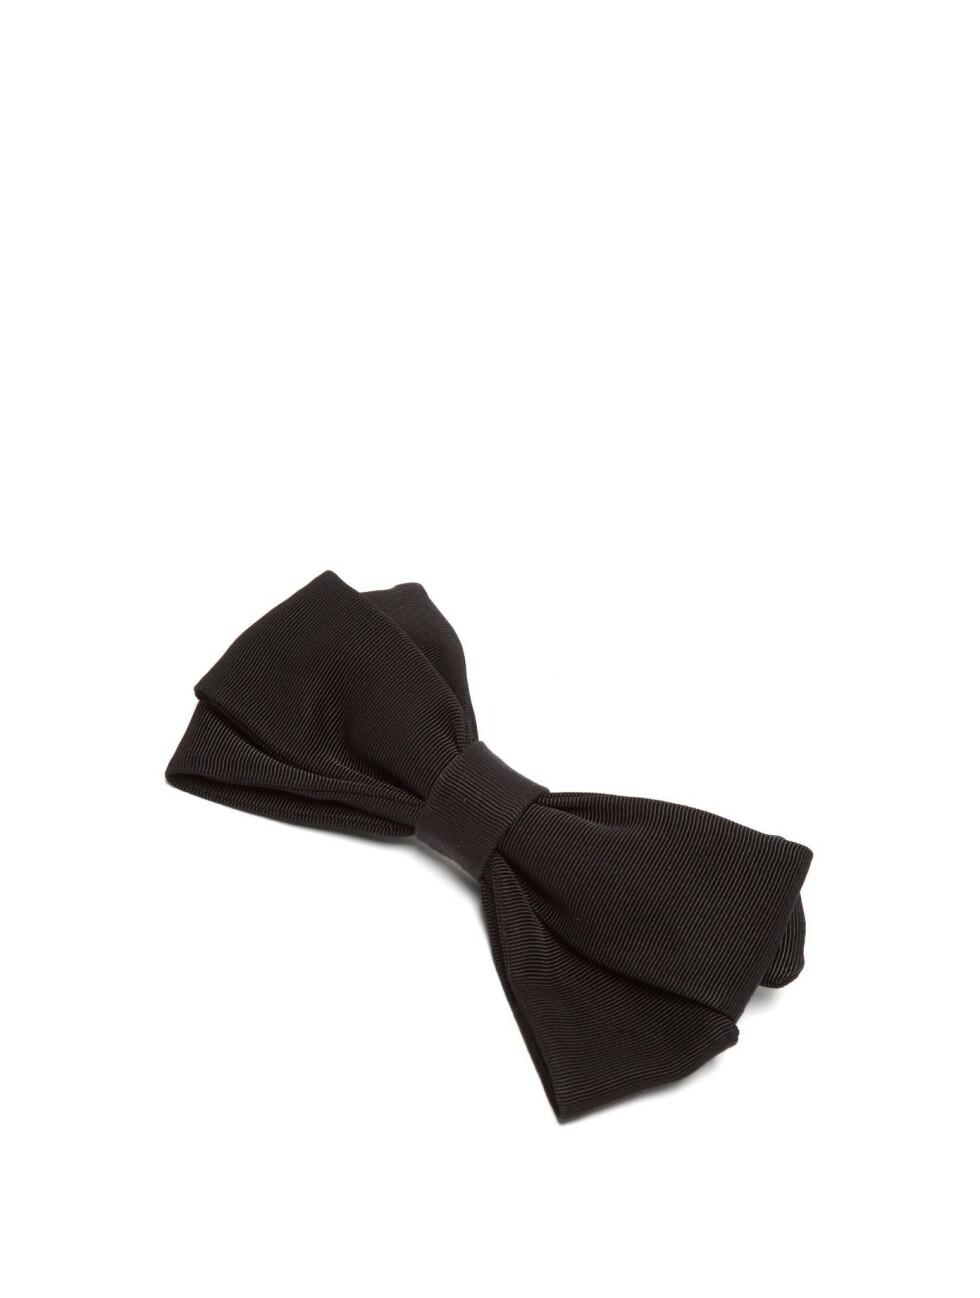 Emilia Wickstead |1120,-| https://www.matchesfashion.com/intl/products/Emilia-Wickstead-Kennedy-bow-shaped-cotton-faille-hair-clip-1266818